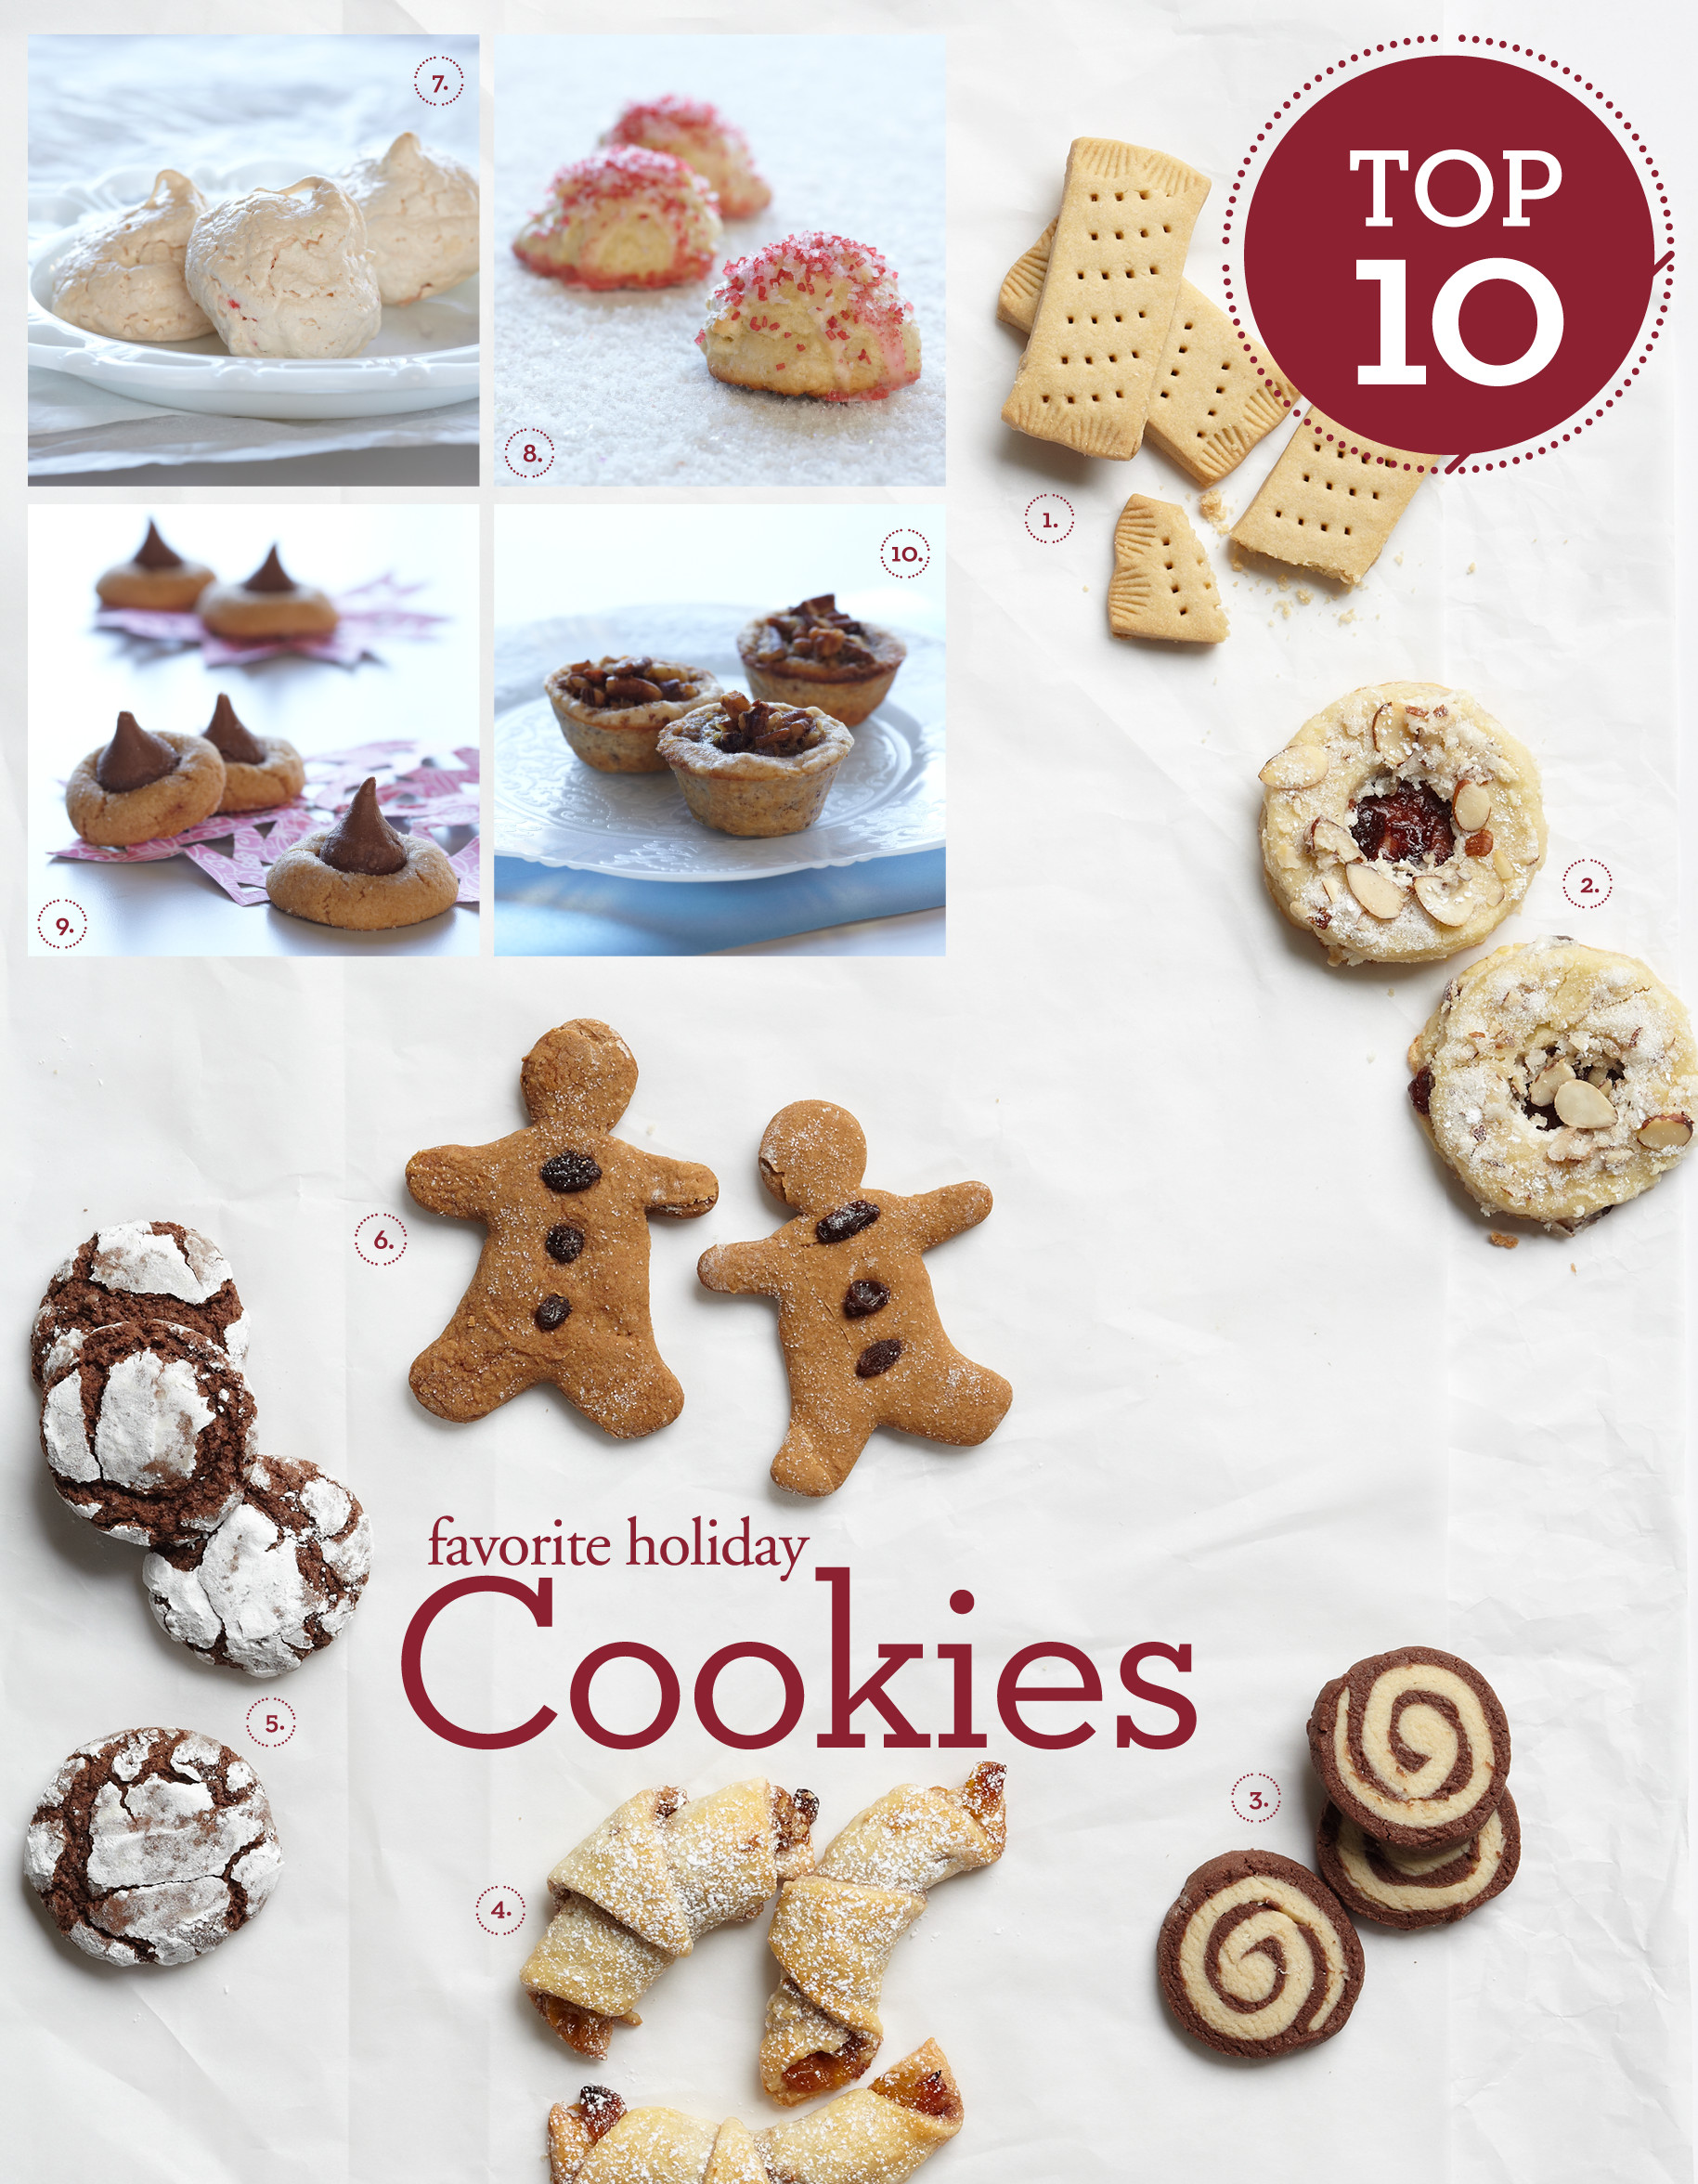 Top 10 Christmas Cookies  Top 10 Favorite Holiday Cookies by Oak Express